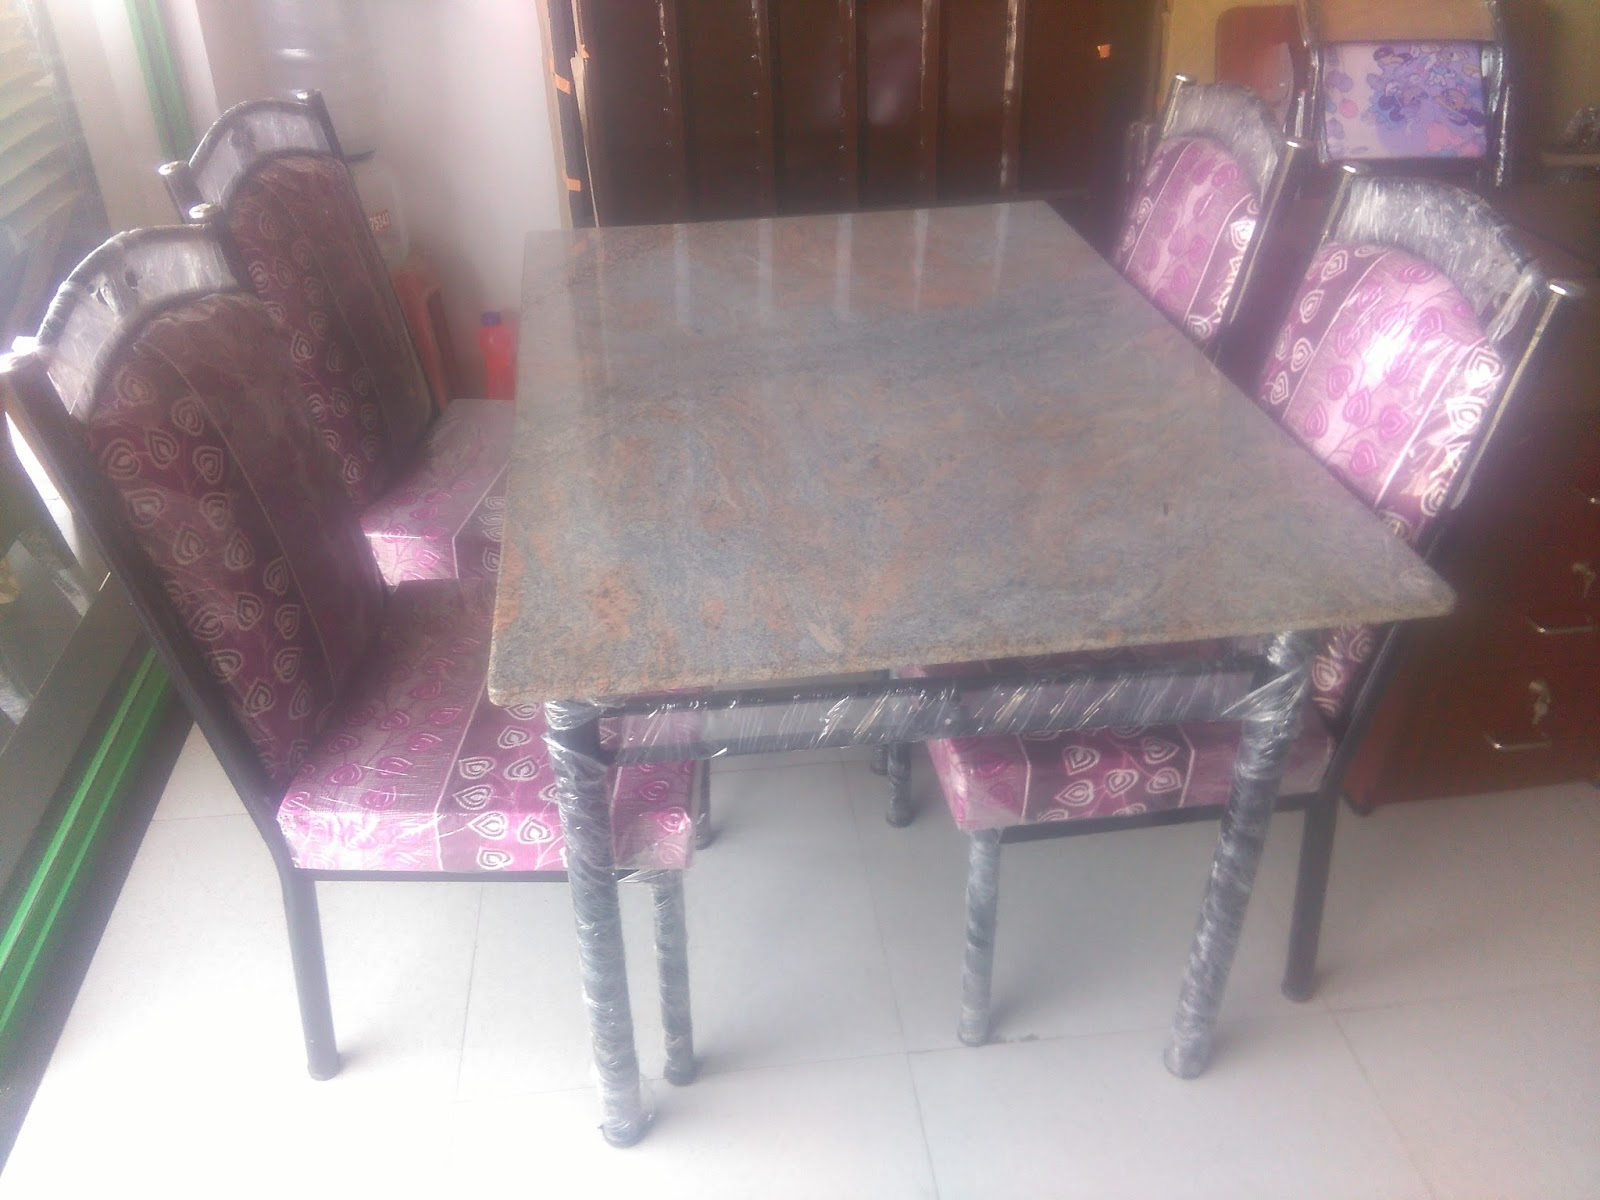 Teak wood cot Steel cot office furniture home  : Aqua4G20170207133907255B1255D from furnitureforsaleingobichettipalayam.blogspot.com size 1600 x 1200 jpeg 207kB